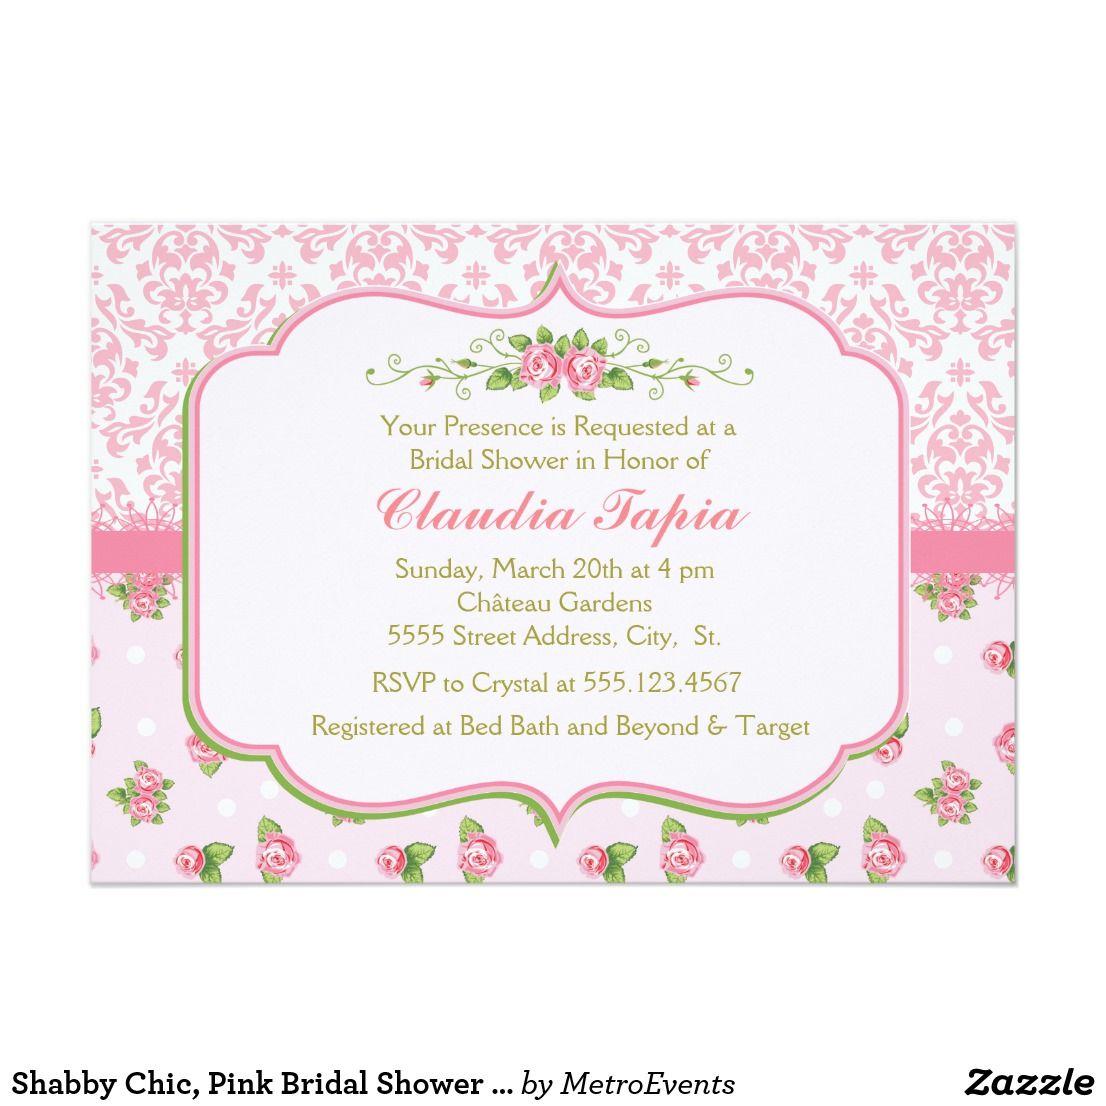 Shabby Chic, Pink Bridal Shower Invitations | Shower invitations ...